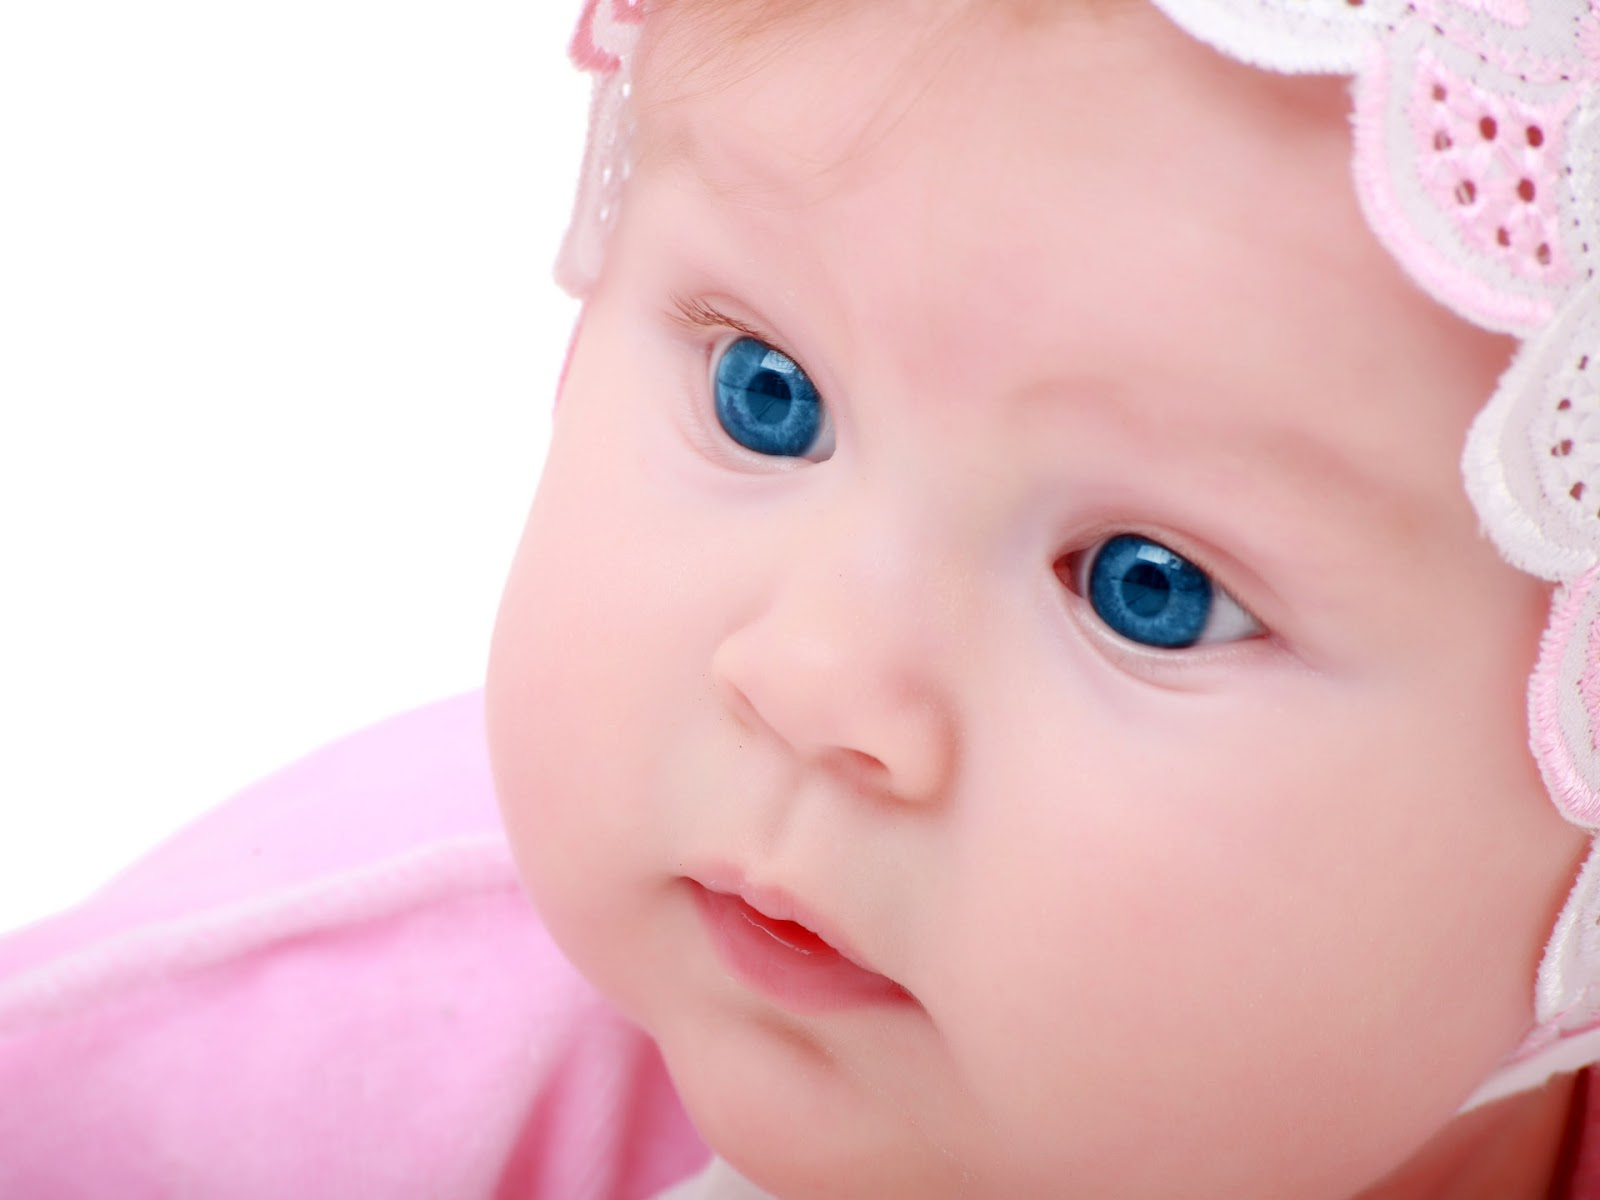 Cute Baby Wallpapers Hd Free: HD Desktop Wallpapers Free Online: Baby